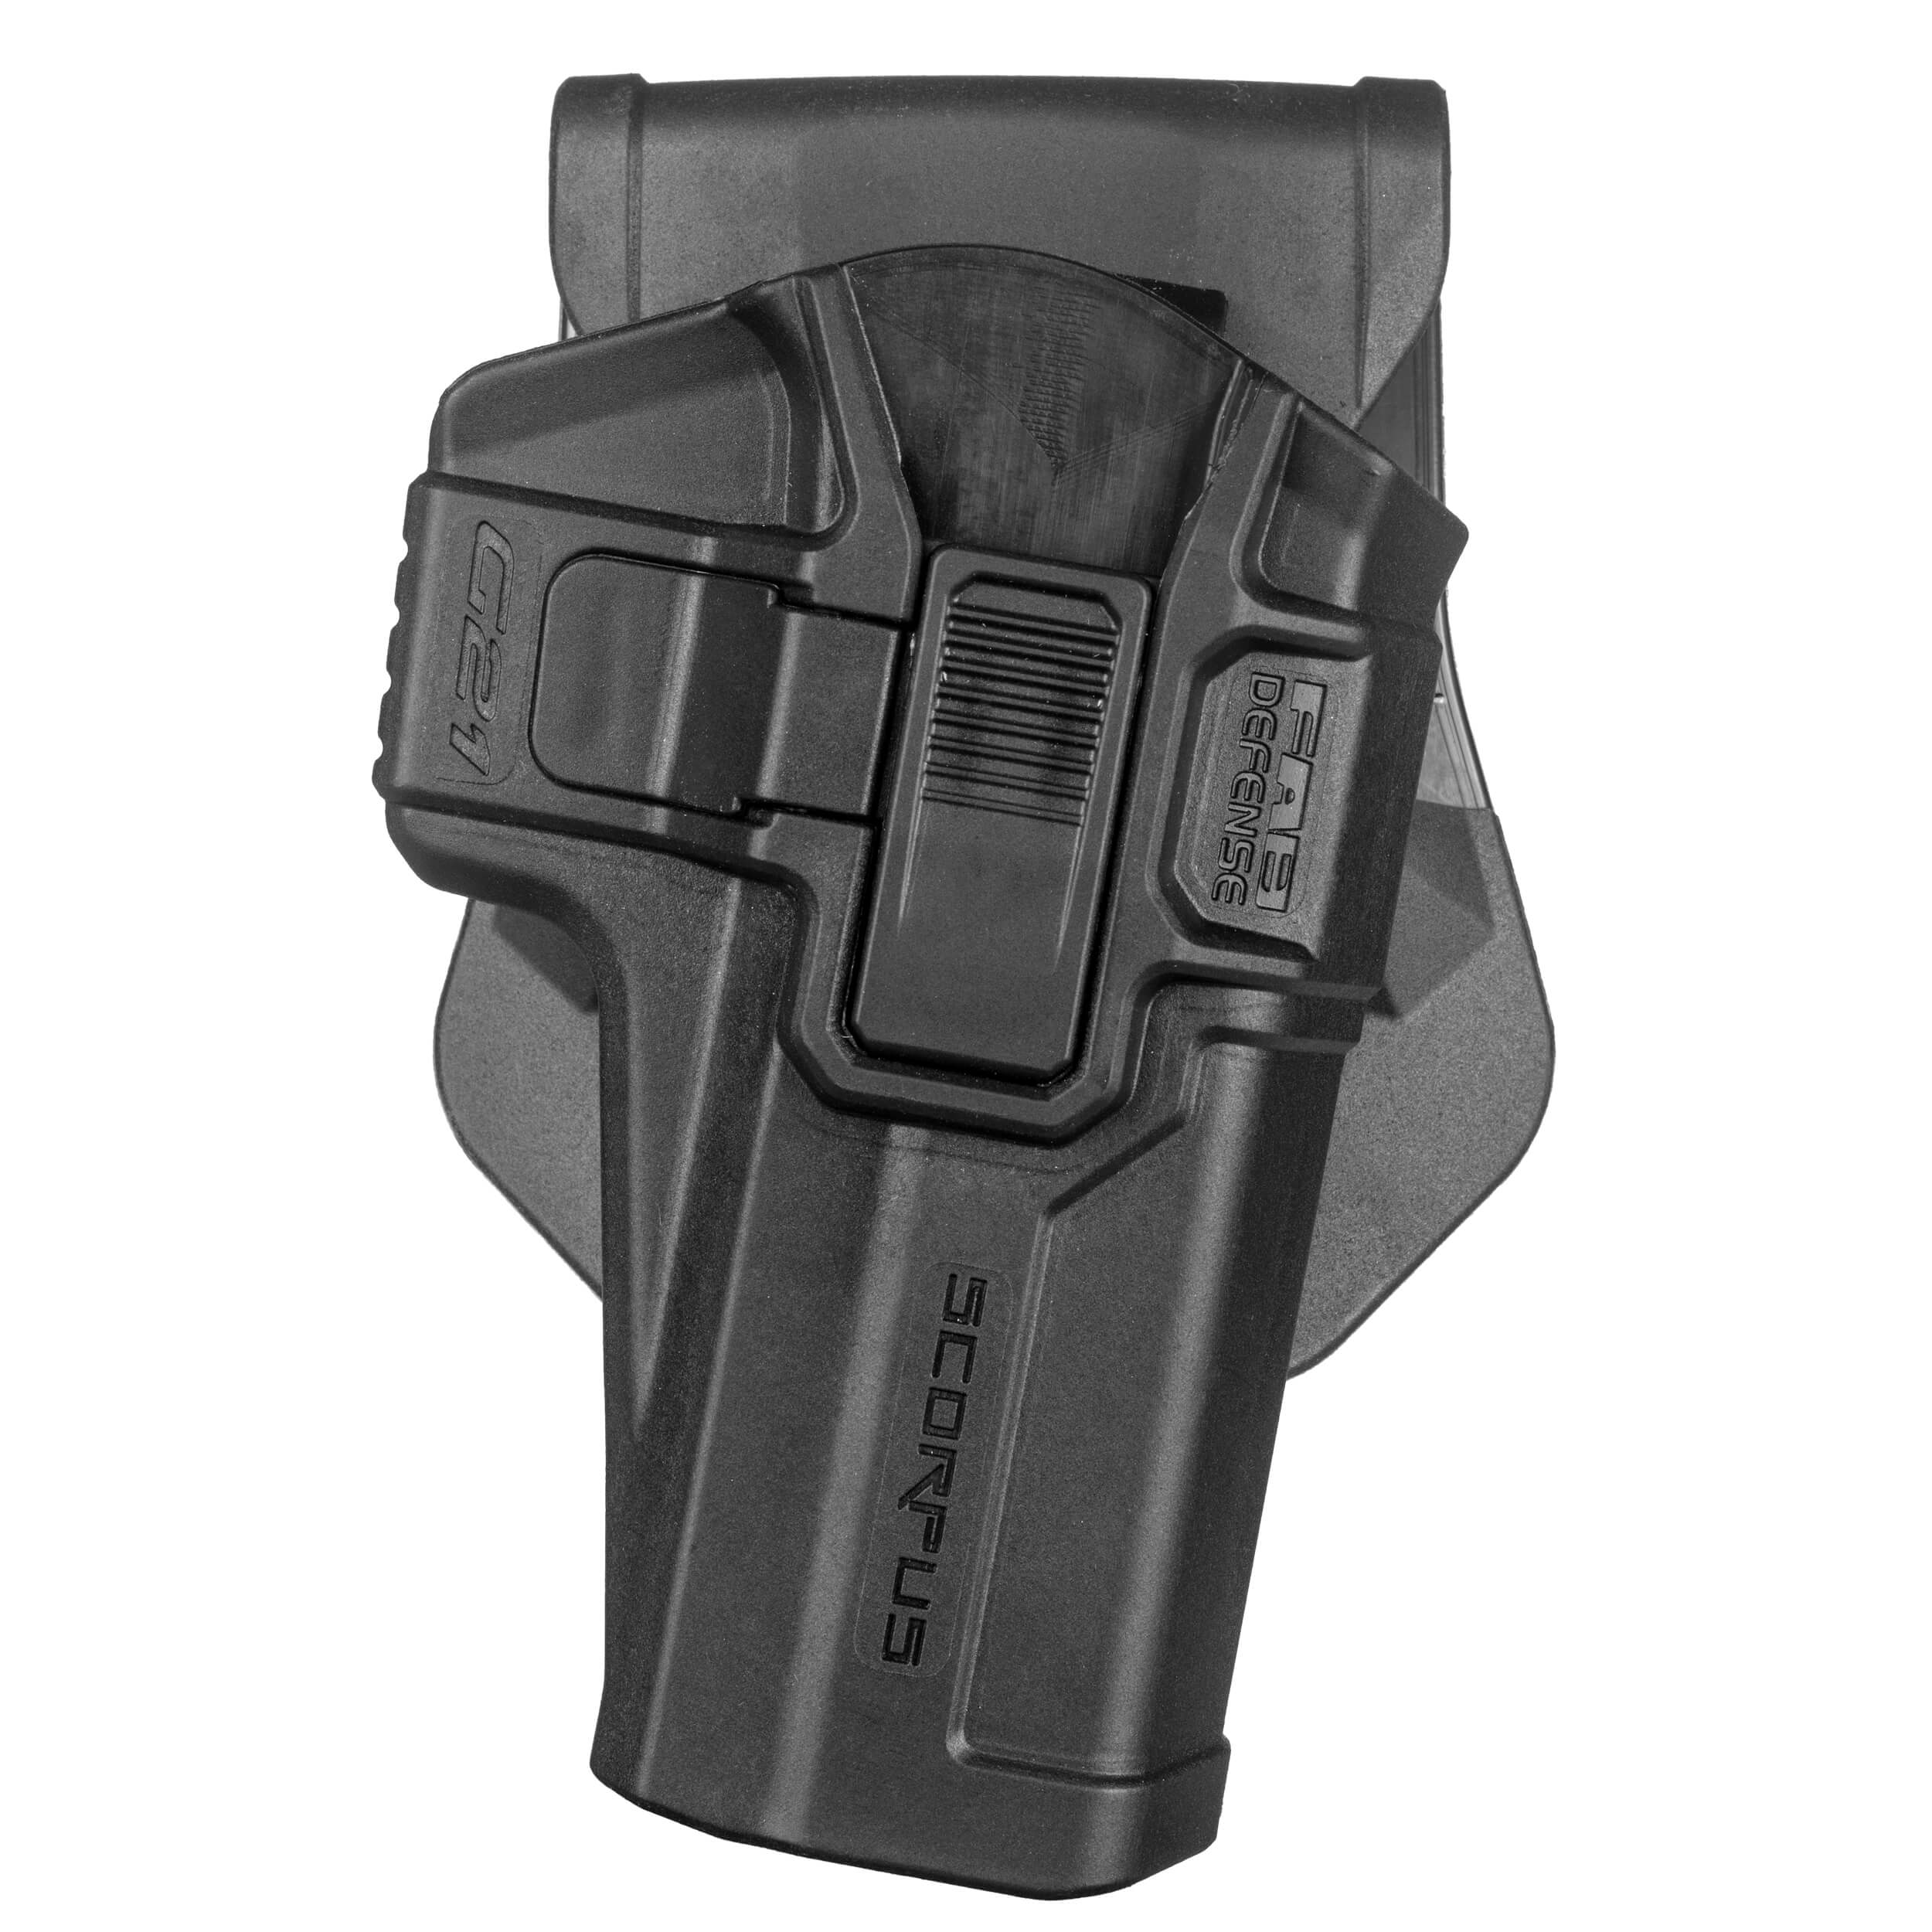 CZ P-10 C  R  (Level 2)  M1 Holster for CZ Pistols